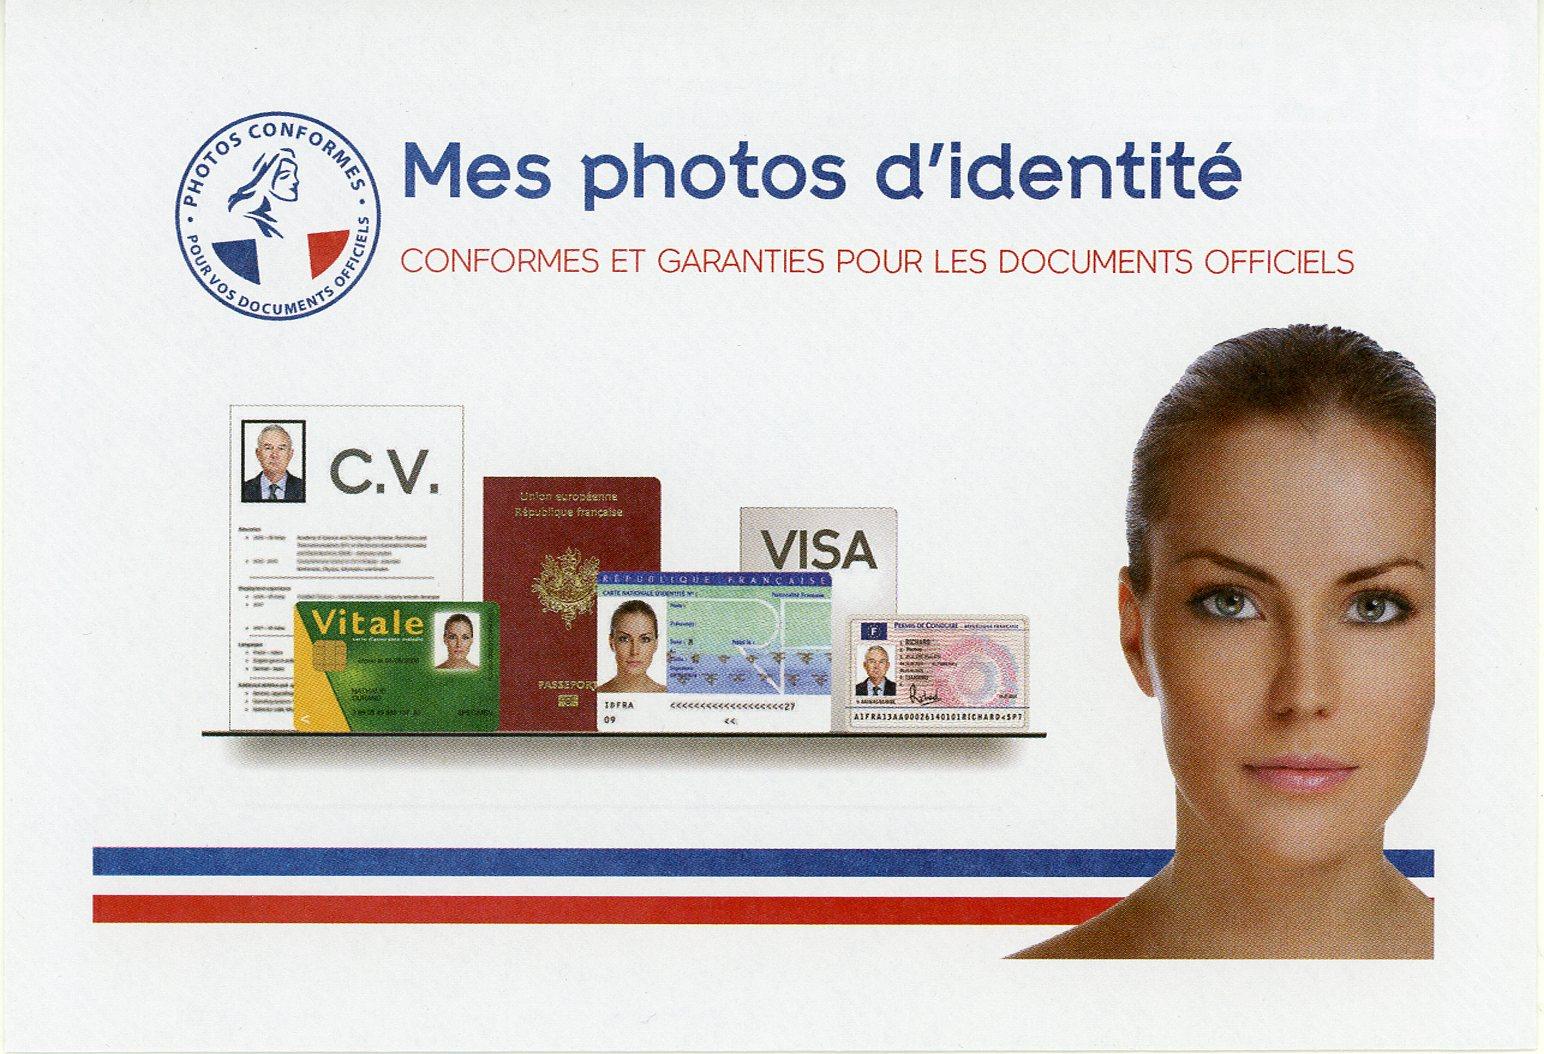 photos d u0026 39 identit u00e9 pour permis  carte d u0026 39 identit u00e9  passeport  cv